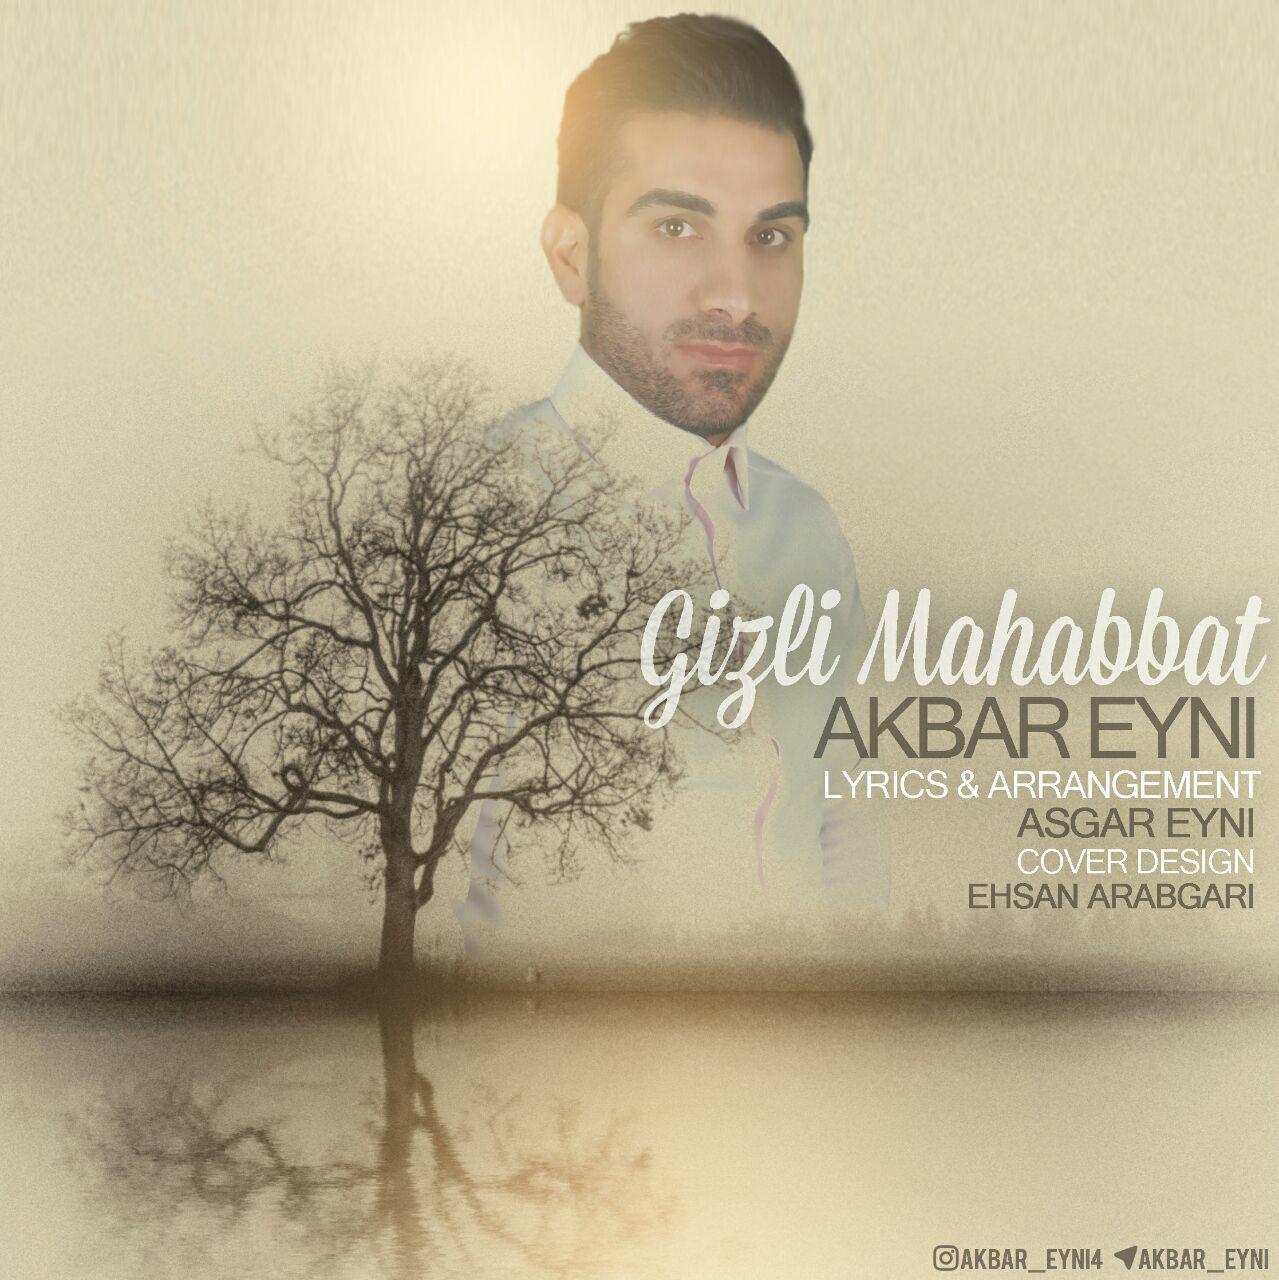 http://s8.picofile.com/file/8300829576/089Akbar_Eyni_Gizli_Mahabbat.jpg